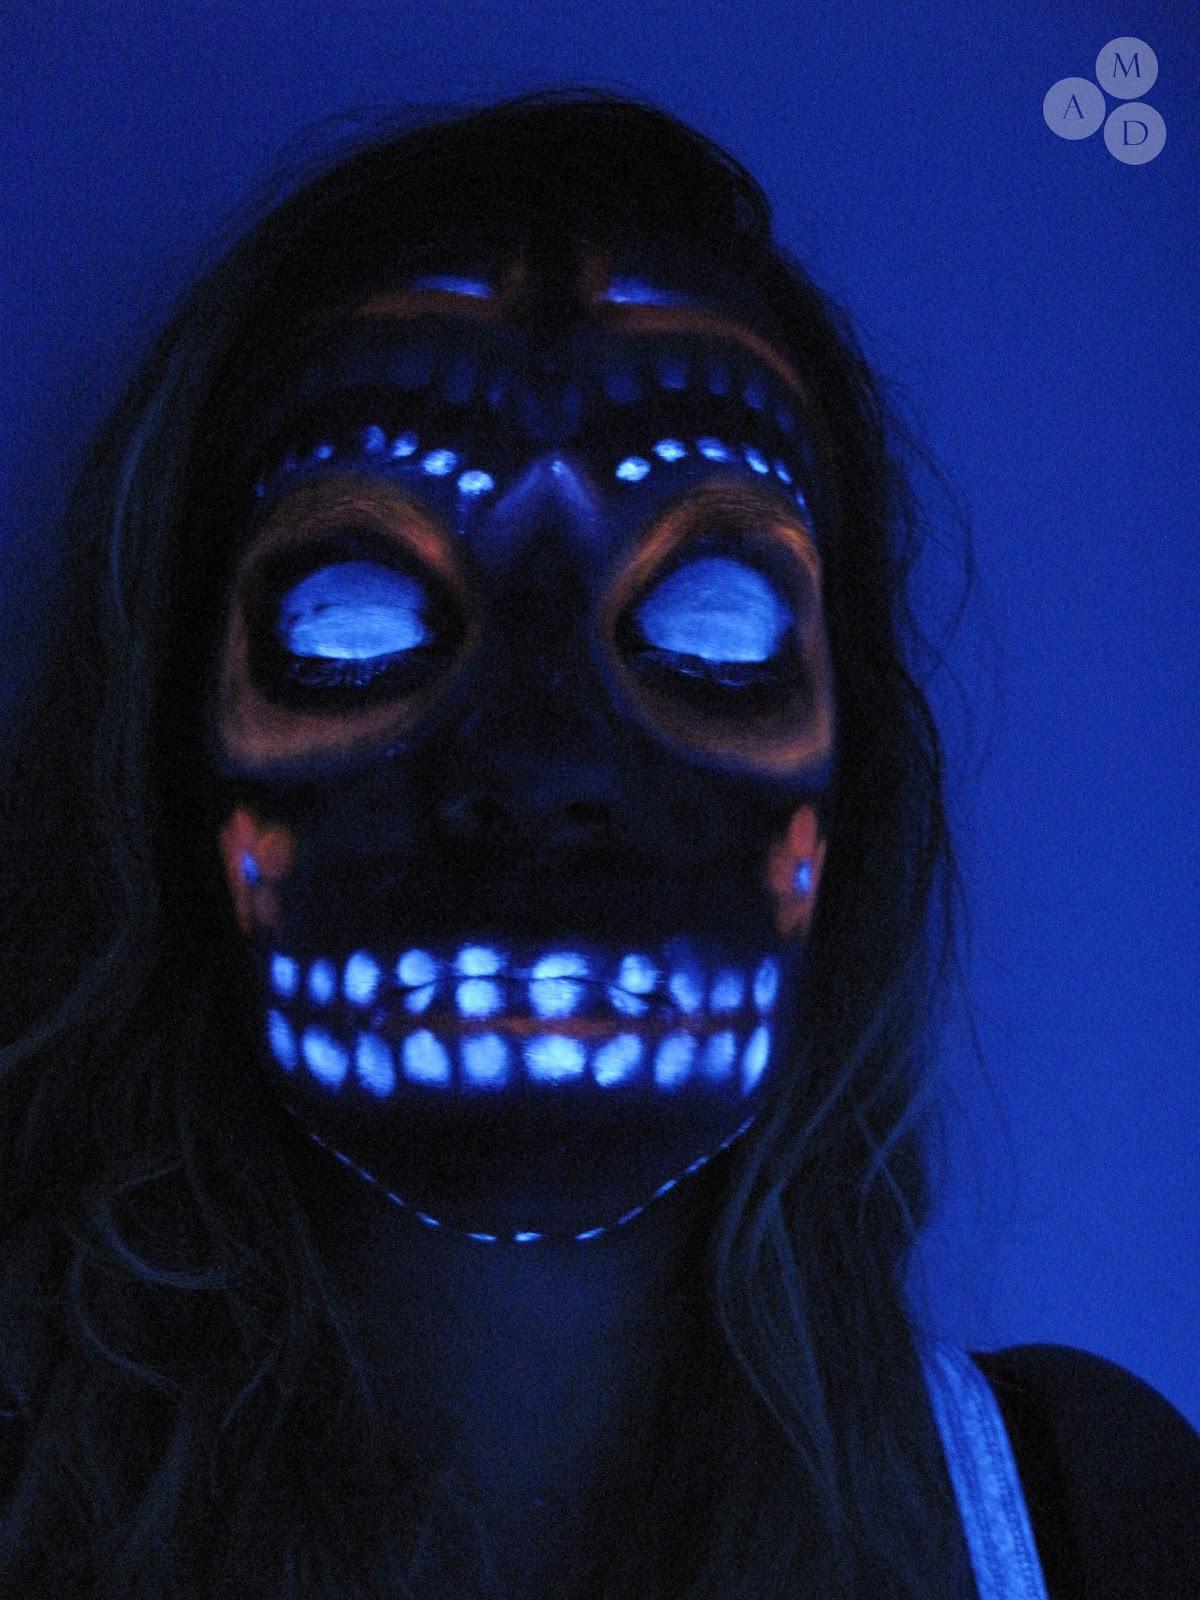 maquillage squelette fluorescent. Black Bedroom Furniture Sets. Home Design Ideas